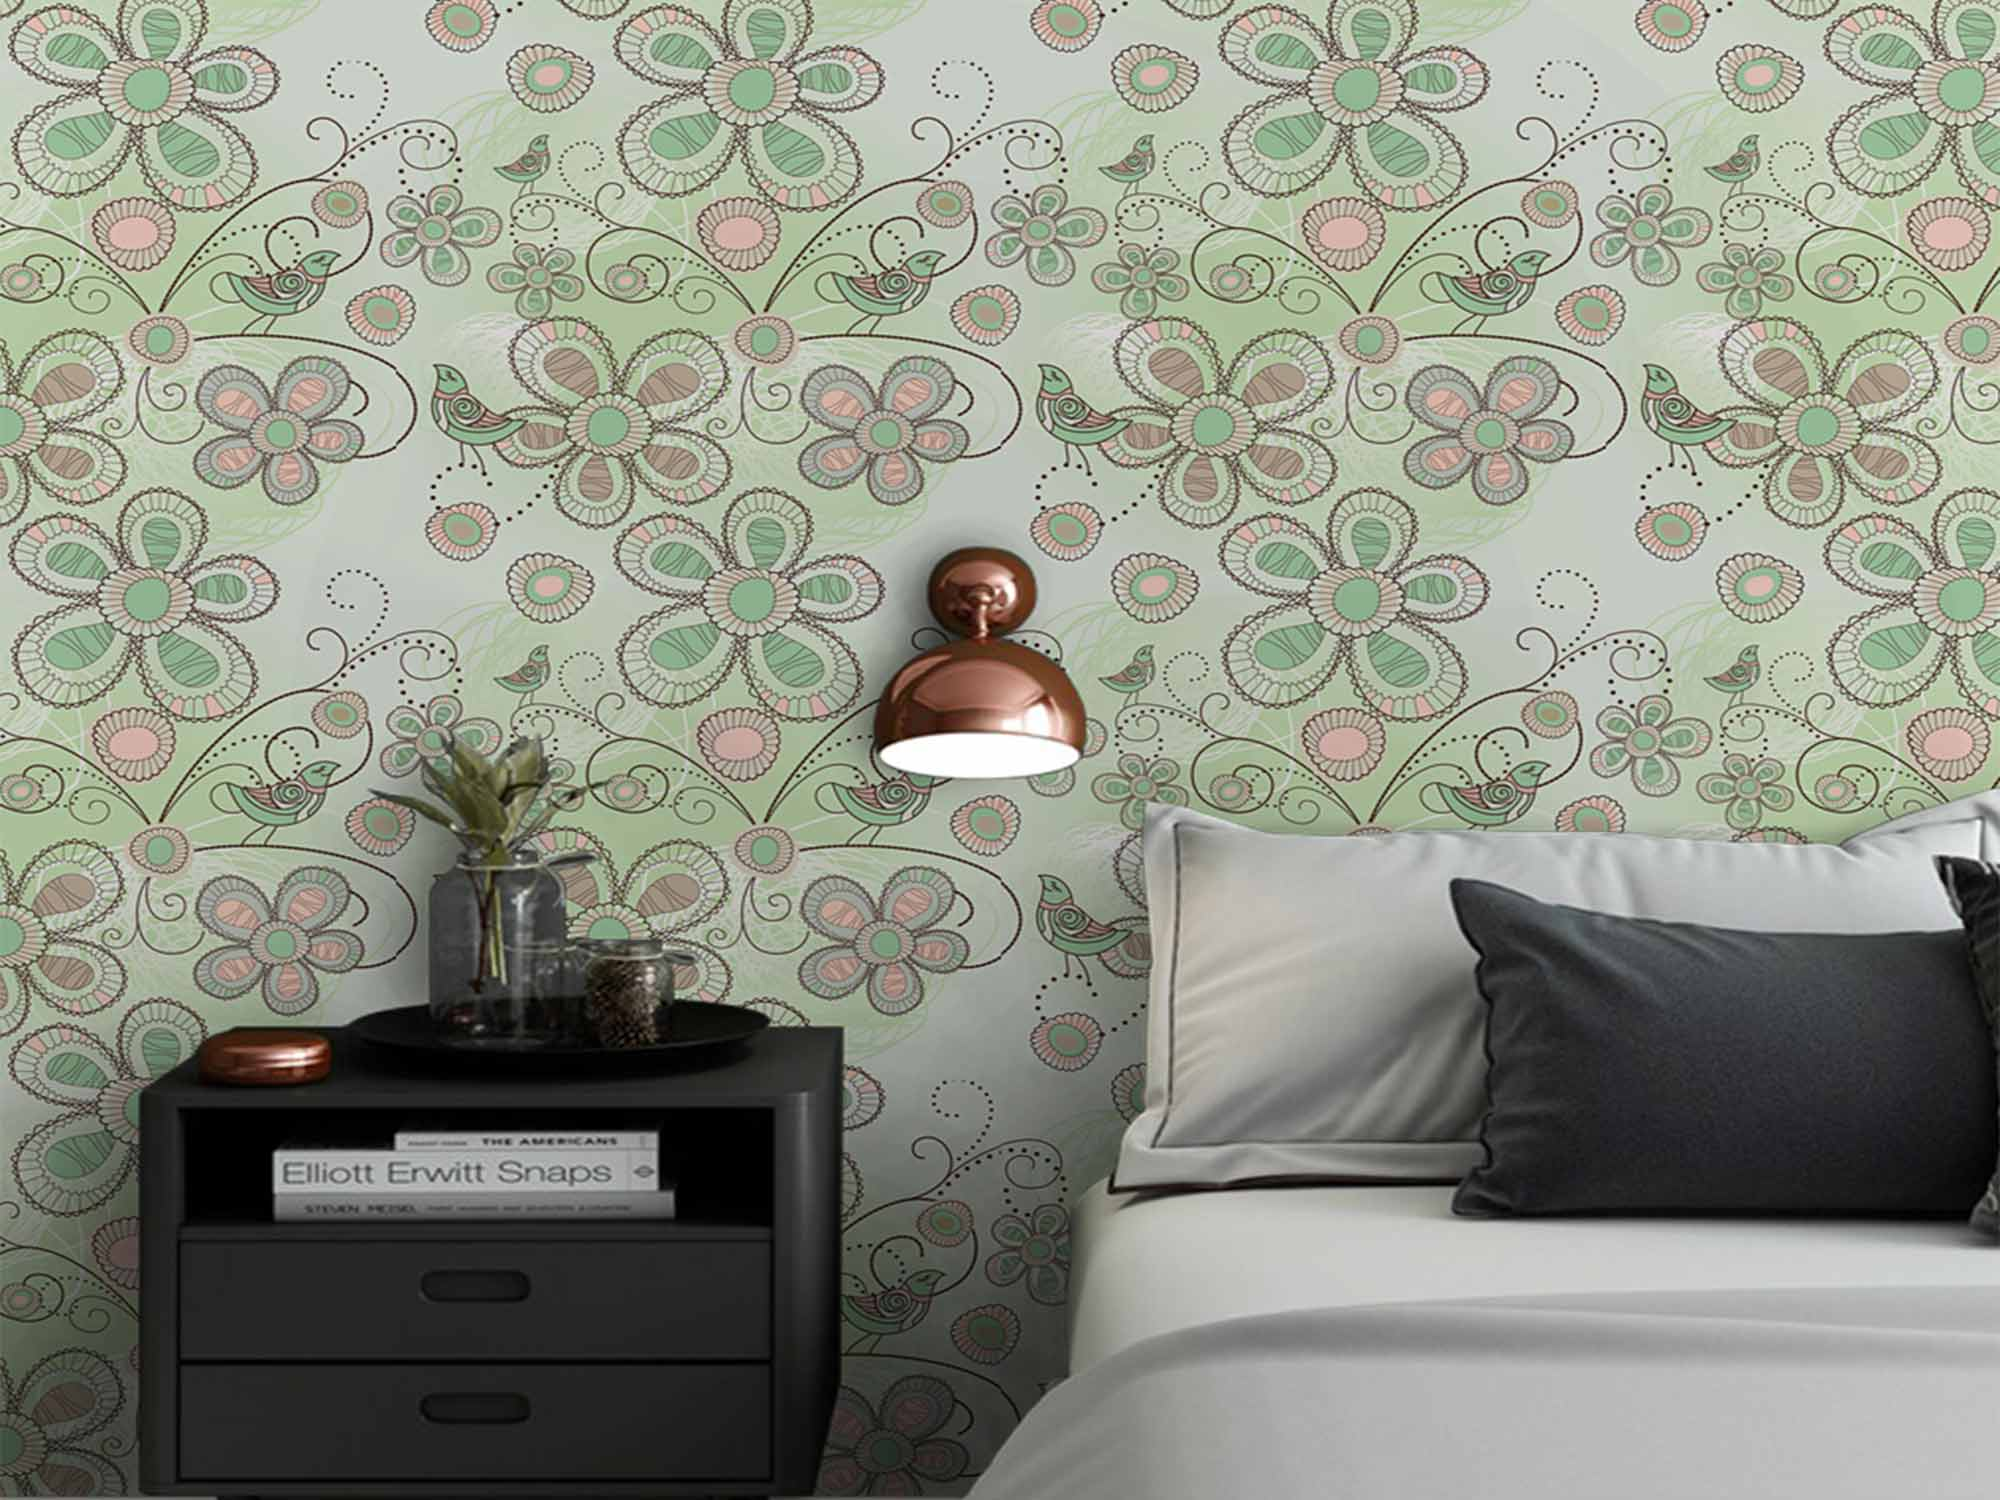 Papel de Parede Floral 0015 - Adesivos de Parede  - Paredes Decoradas